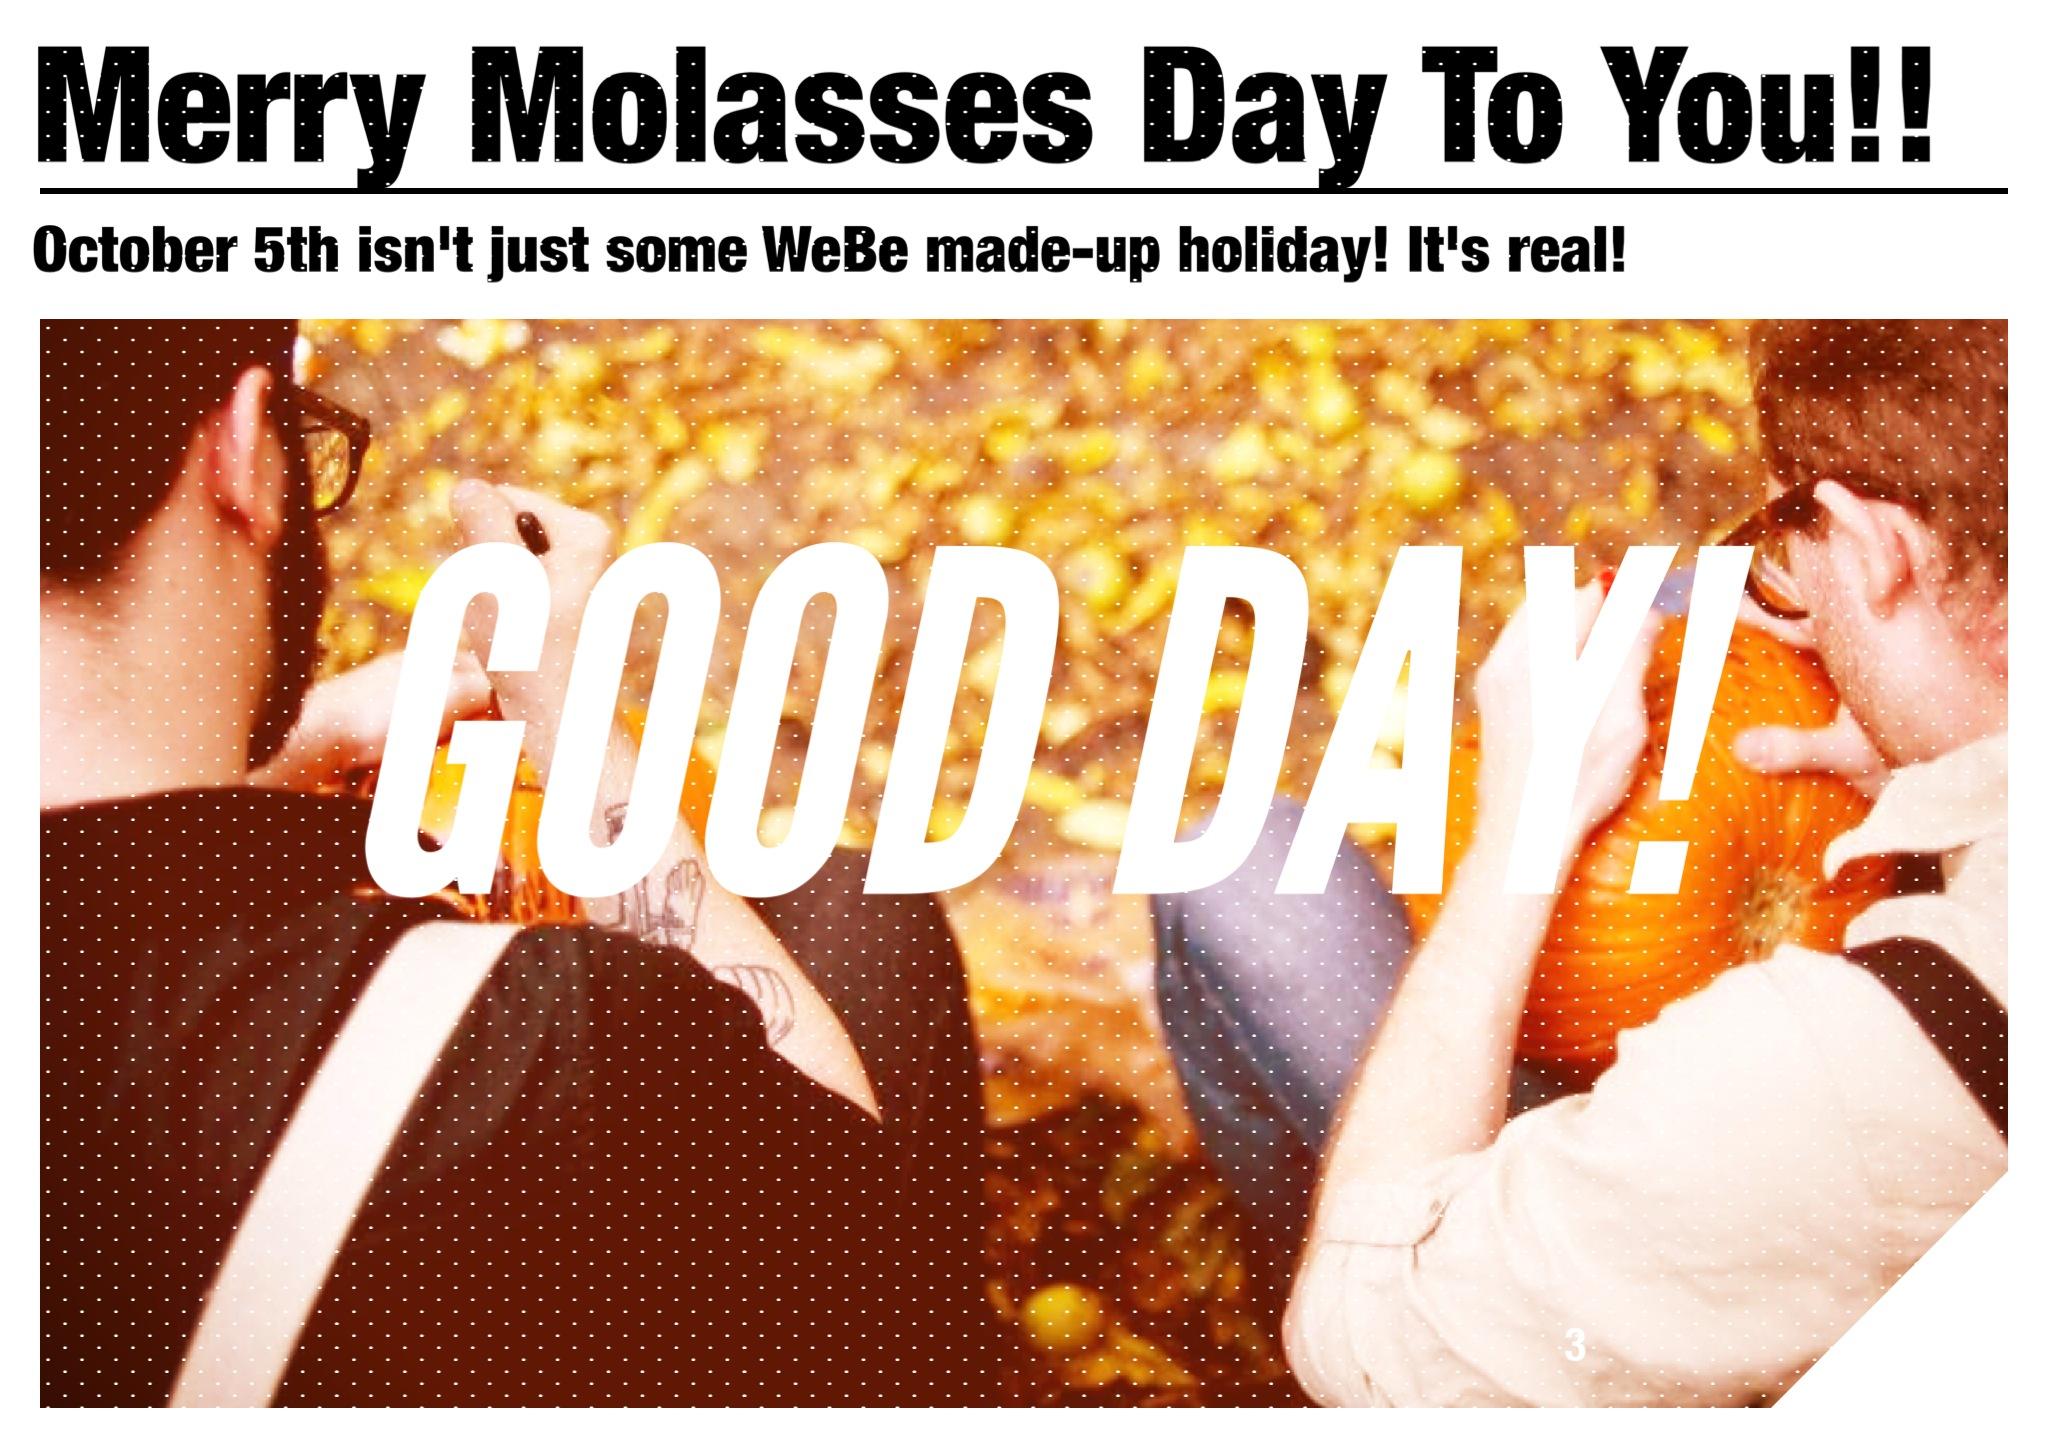 Molasses Day 2013 - Beardos.jpg